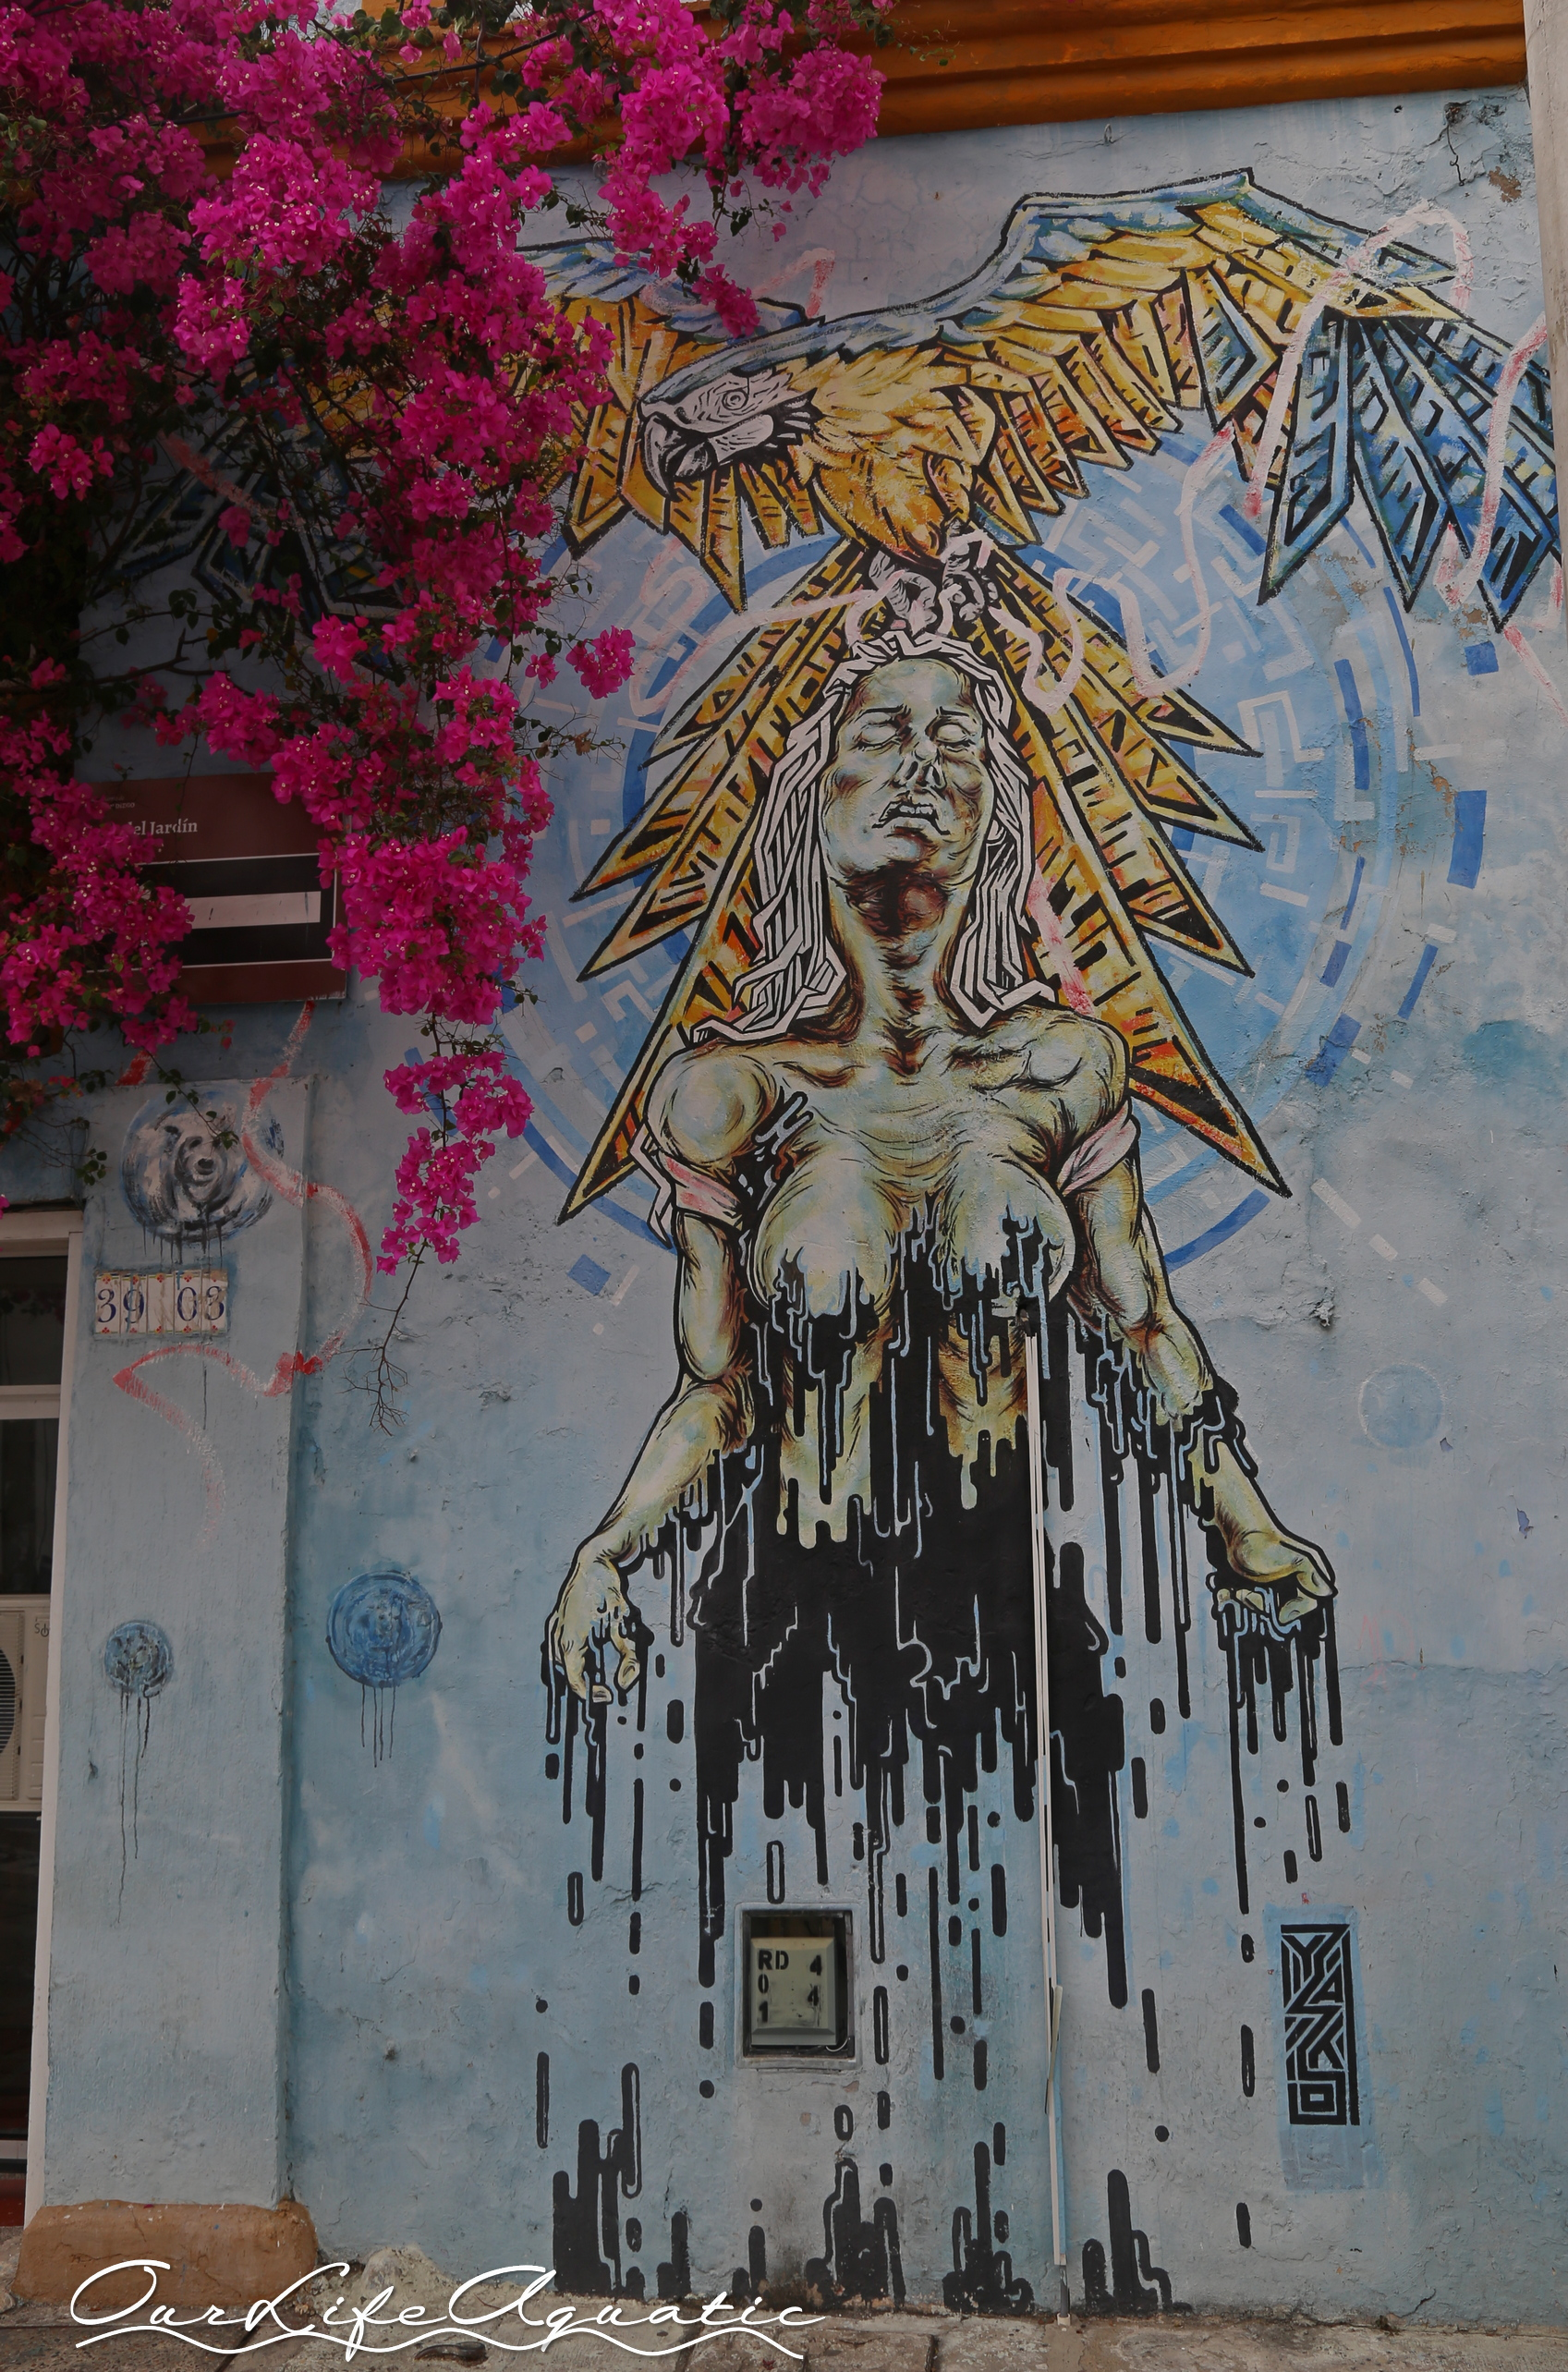 Love the graffiti